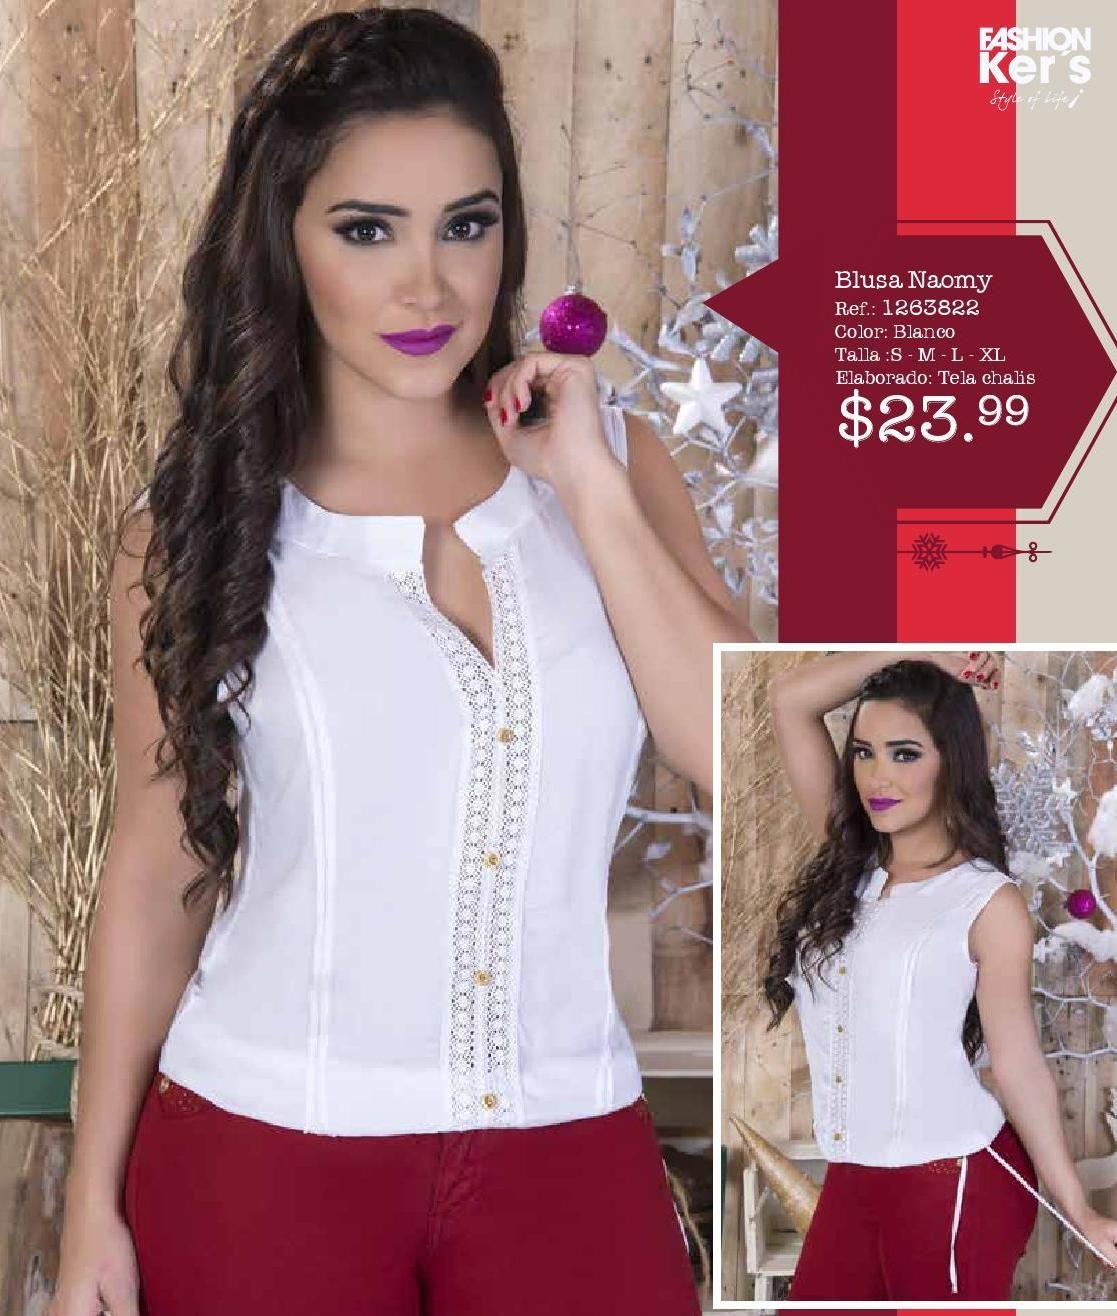 2014catalogo Kers Campana 38 Fashion Women Shirts Blouse Lace Frocks